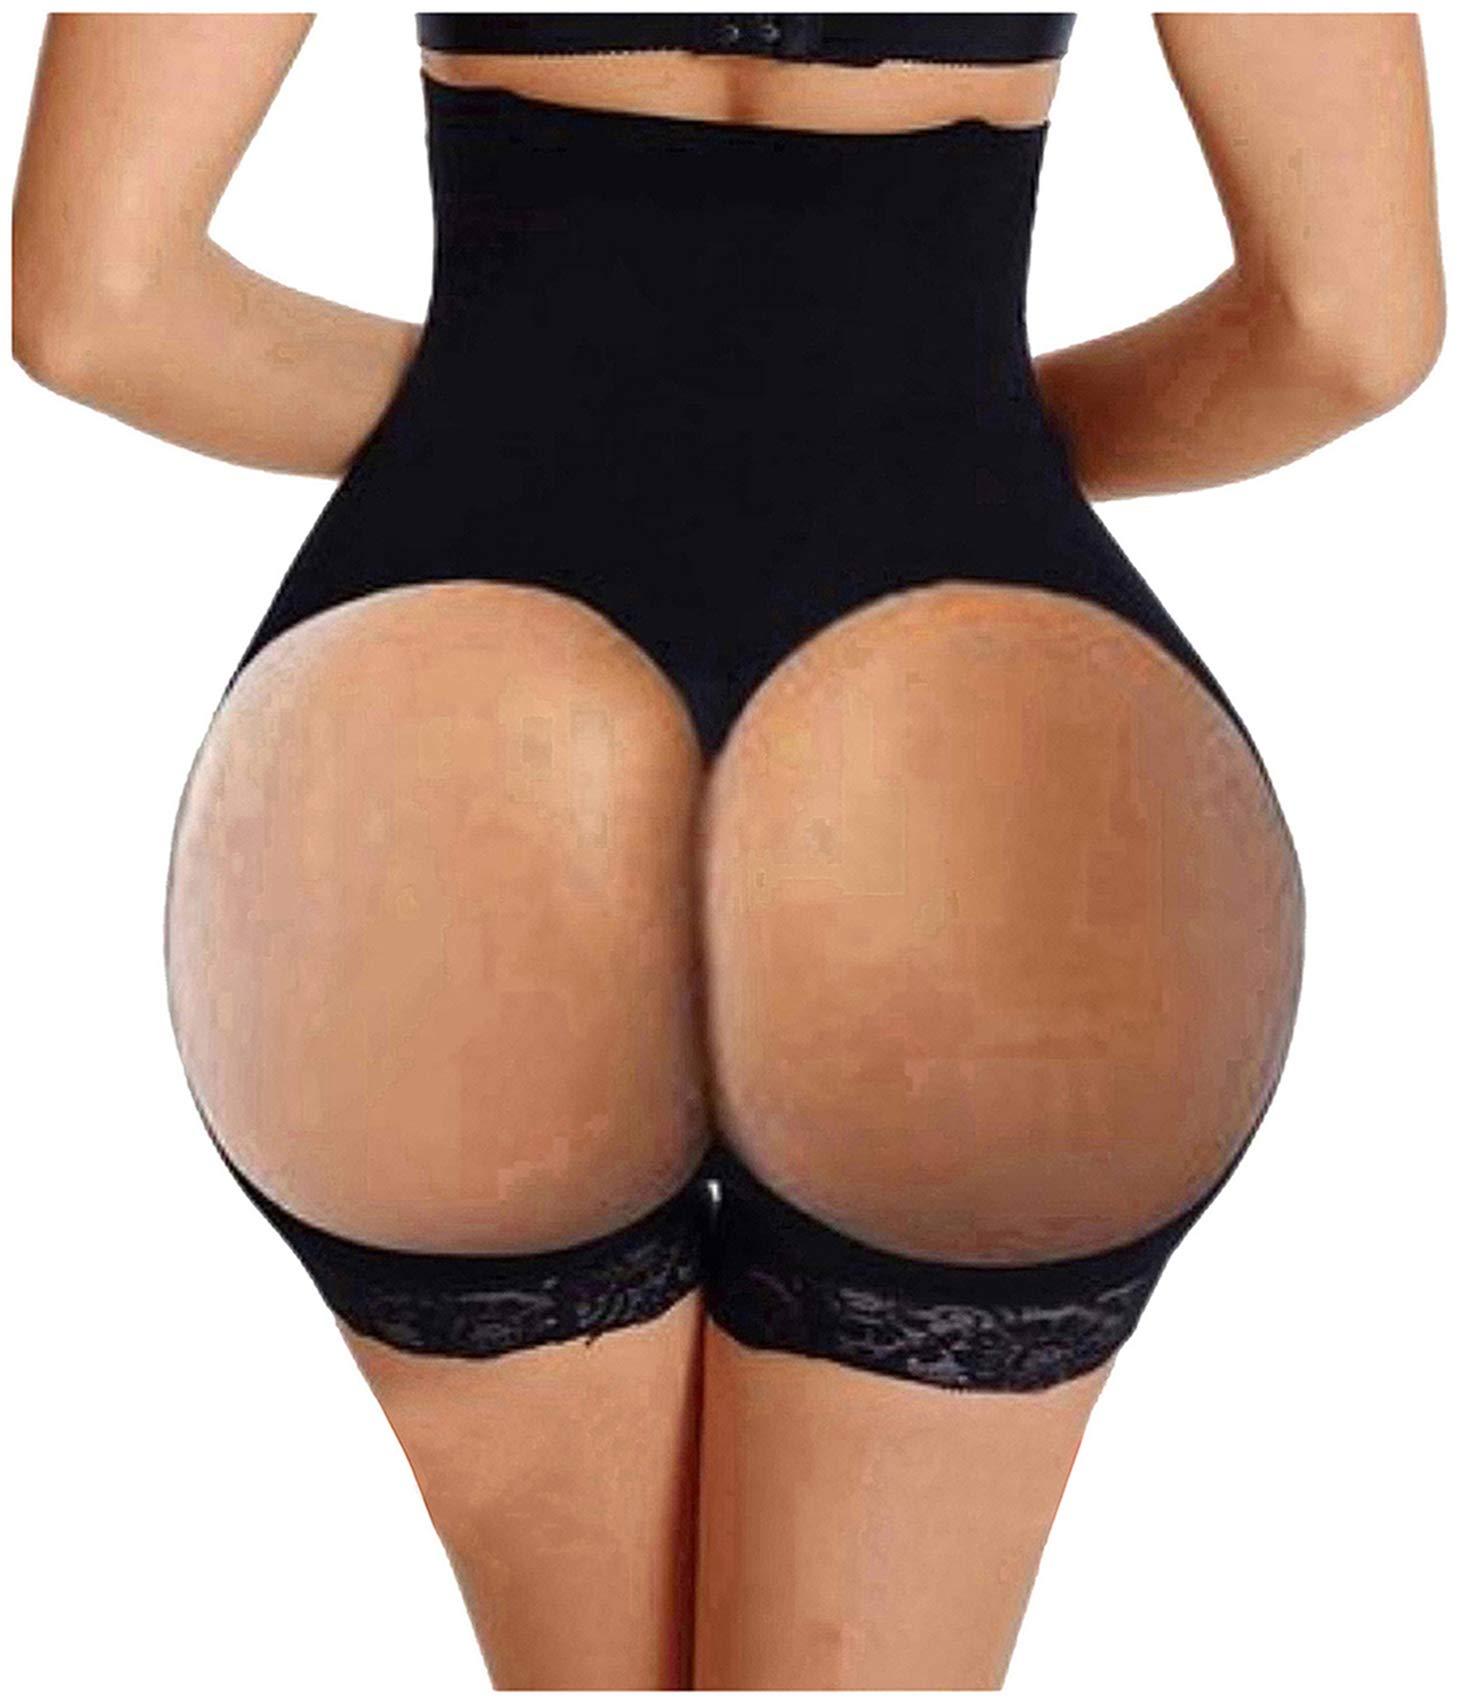 Gotoly Hourglass Figure Butt Lifter Shaper Panties Tummy Control High Waisted Boyshort (Black, 3XL/4XL(Prime))